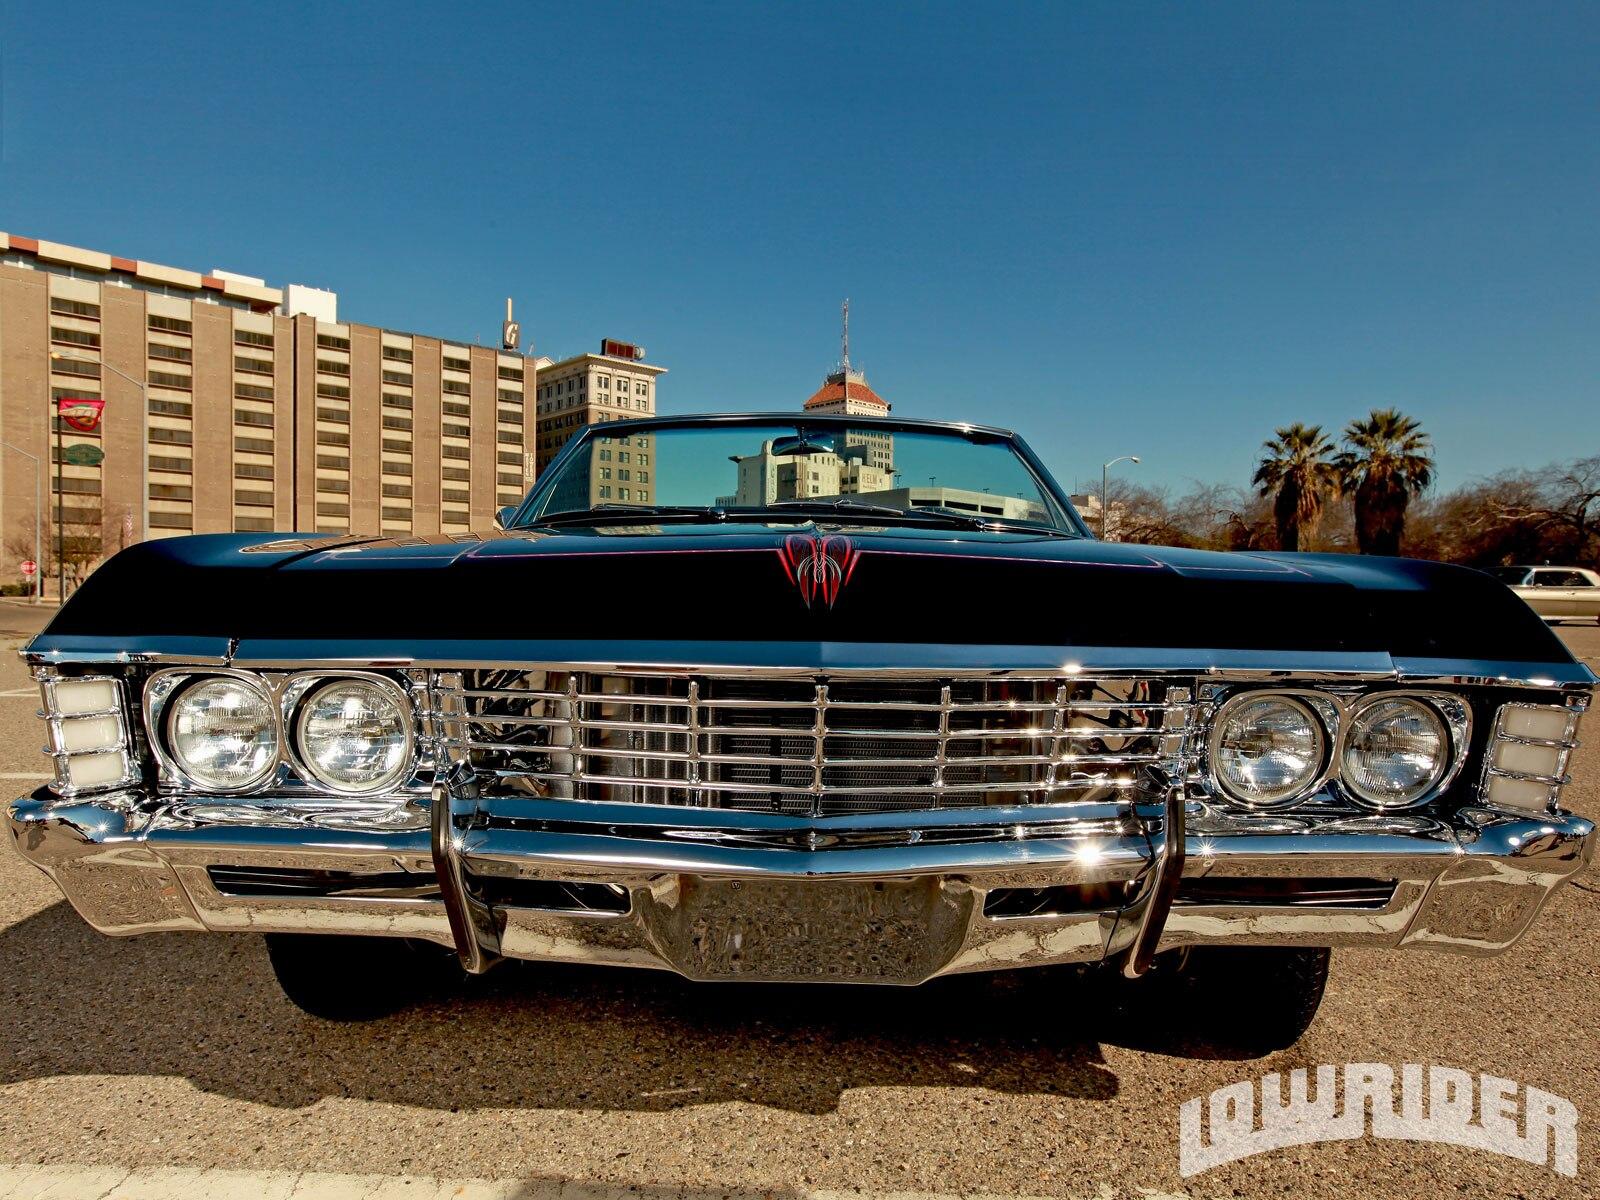 1967 chevrolet impala convertible - lowrider magazine